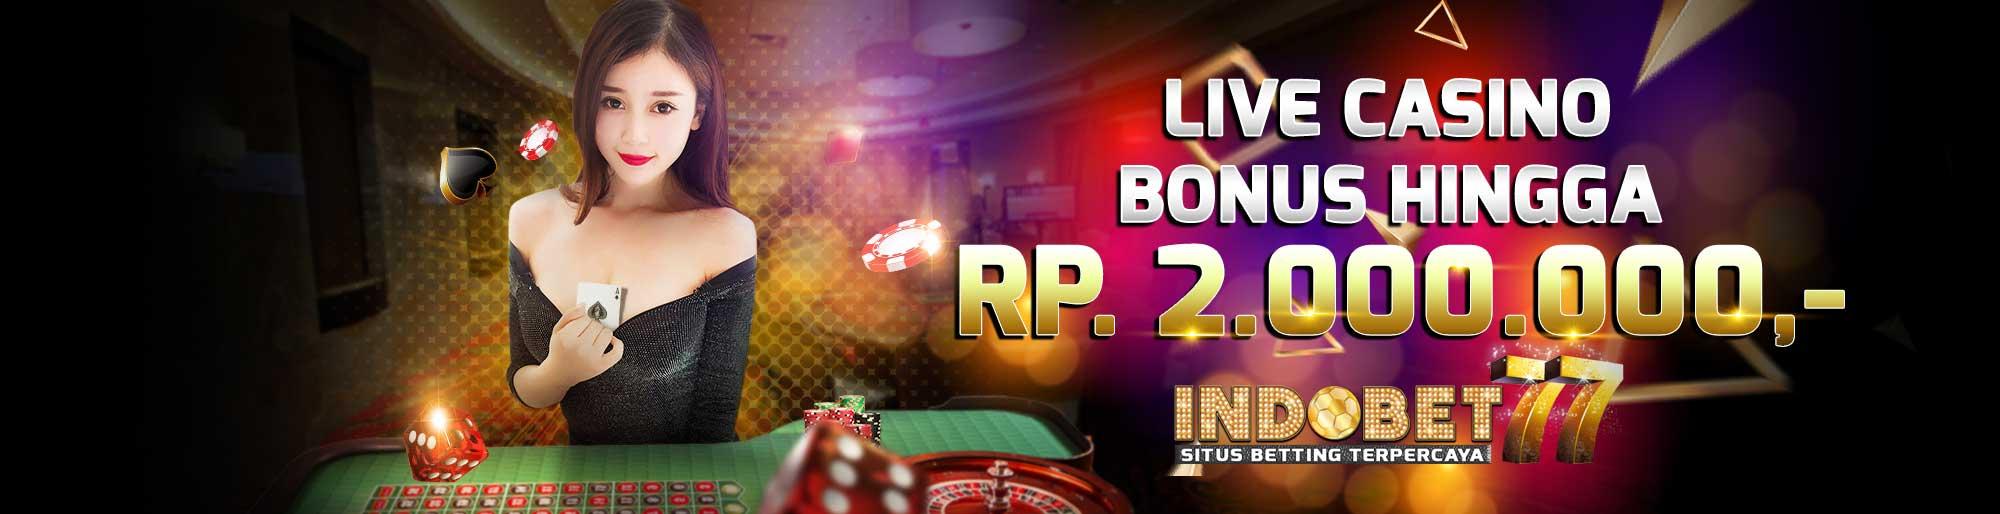 promo bonus deposit live casino online dari agen judi online terpercaya